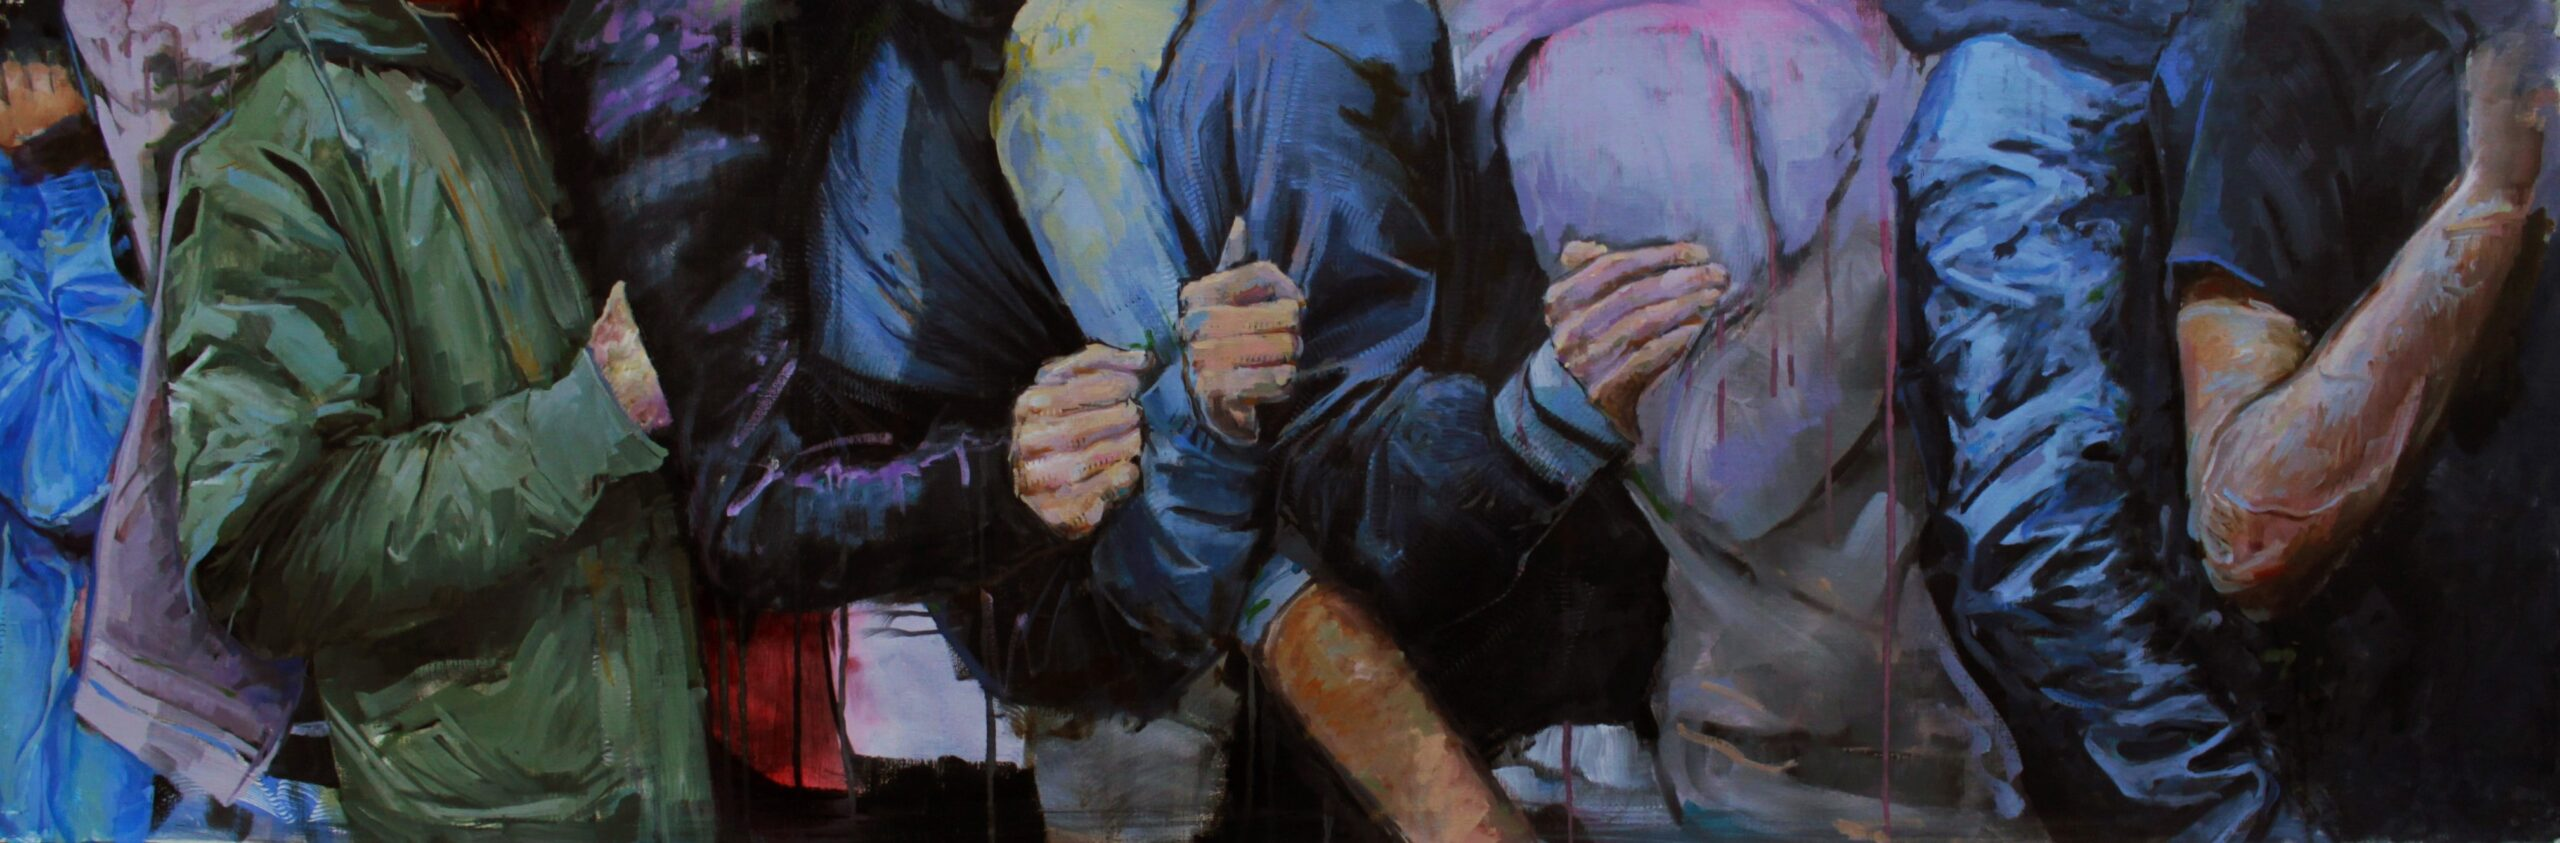 Line up #2. Boris Garanger. Jackson's Painting Prize.